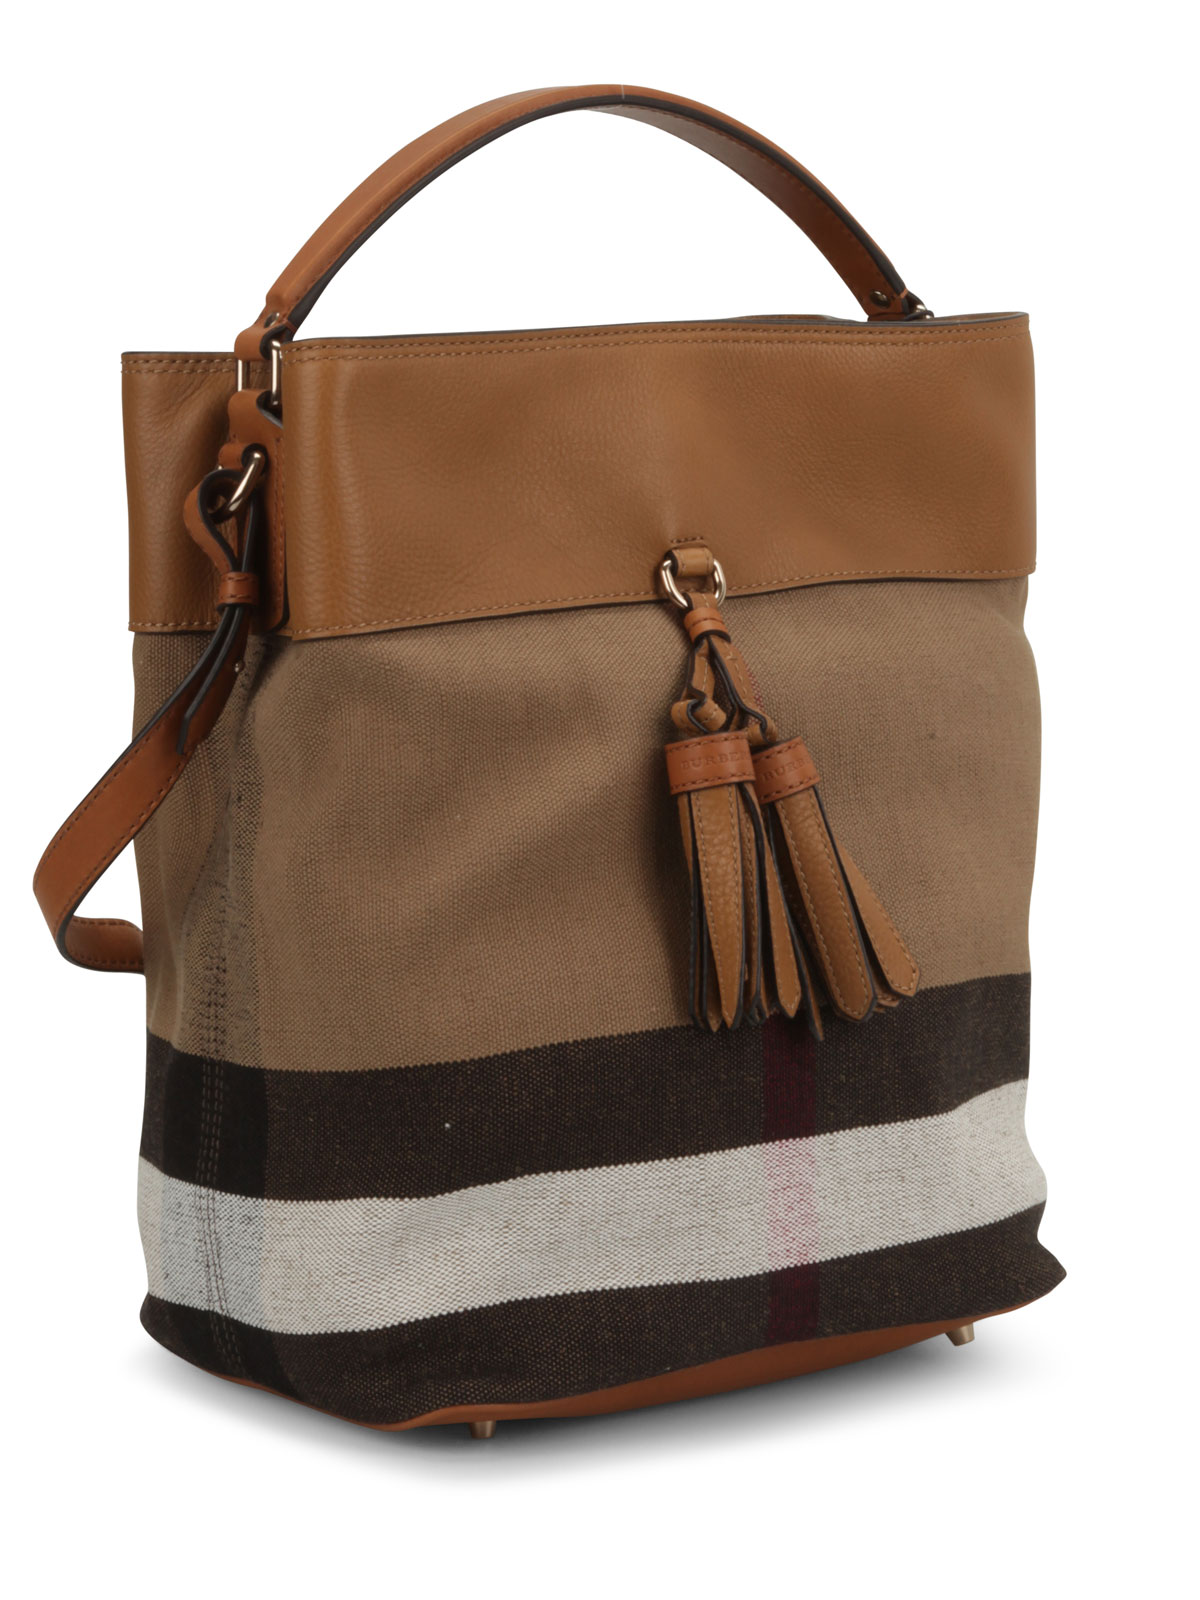 Burberry - Susanna Canvas Check hobo bag - shoulder bags - 39829371 e617b2f97f3dd